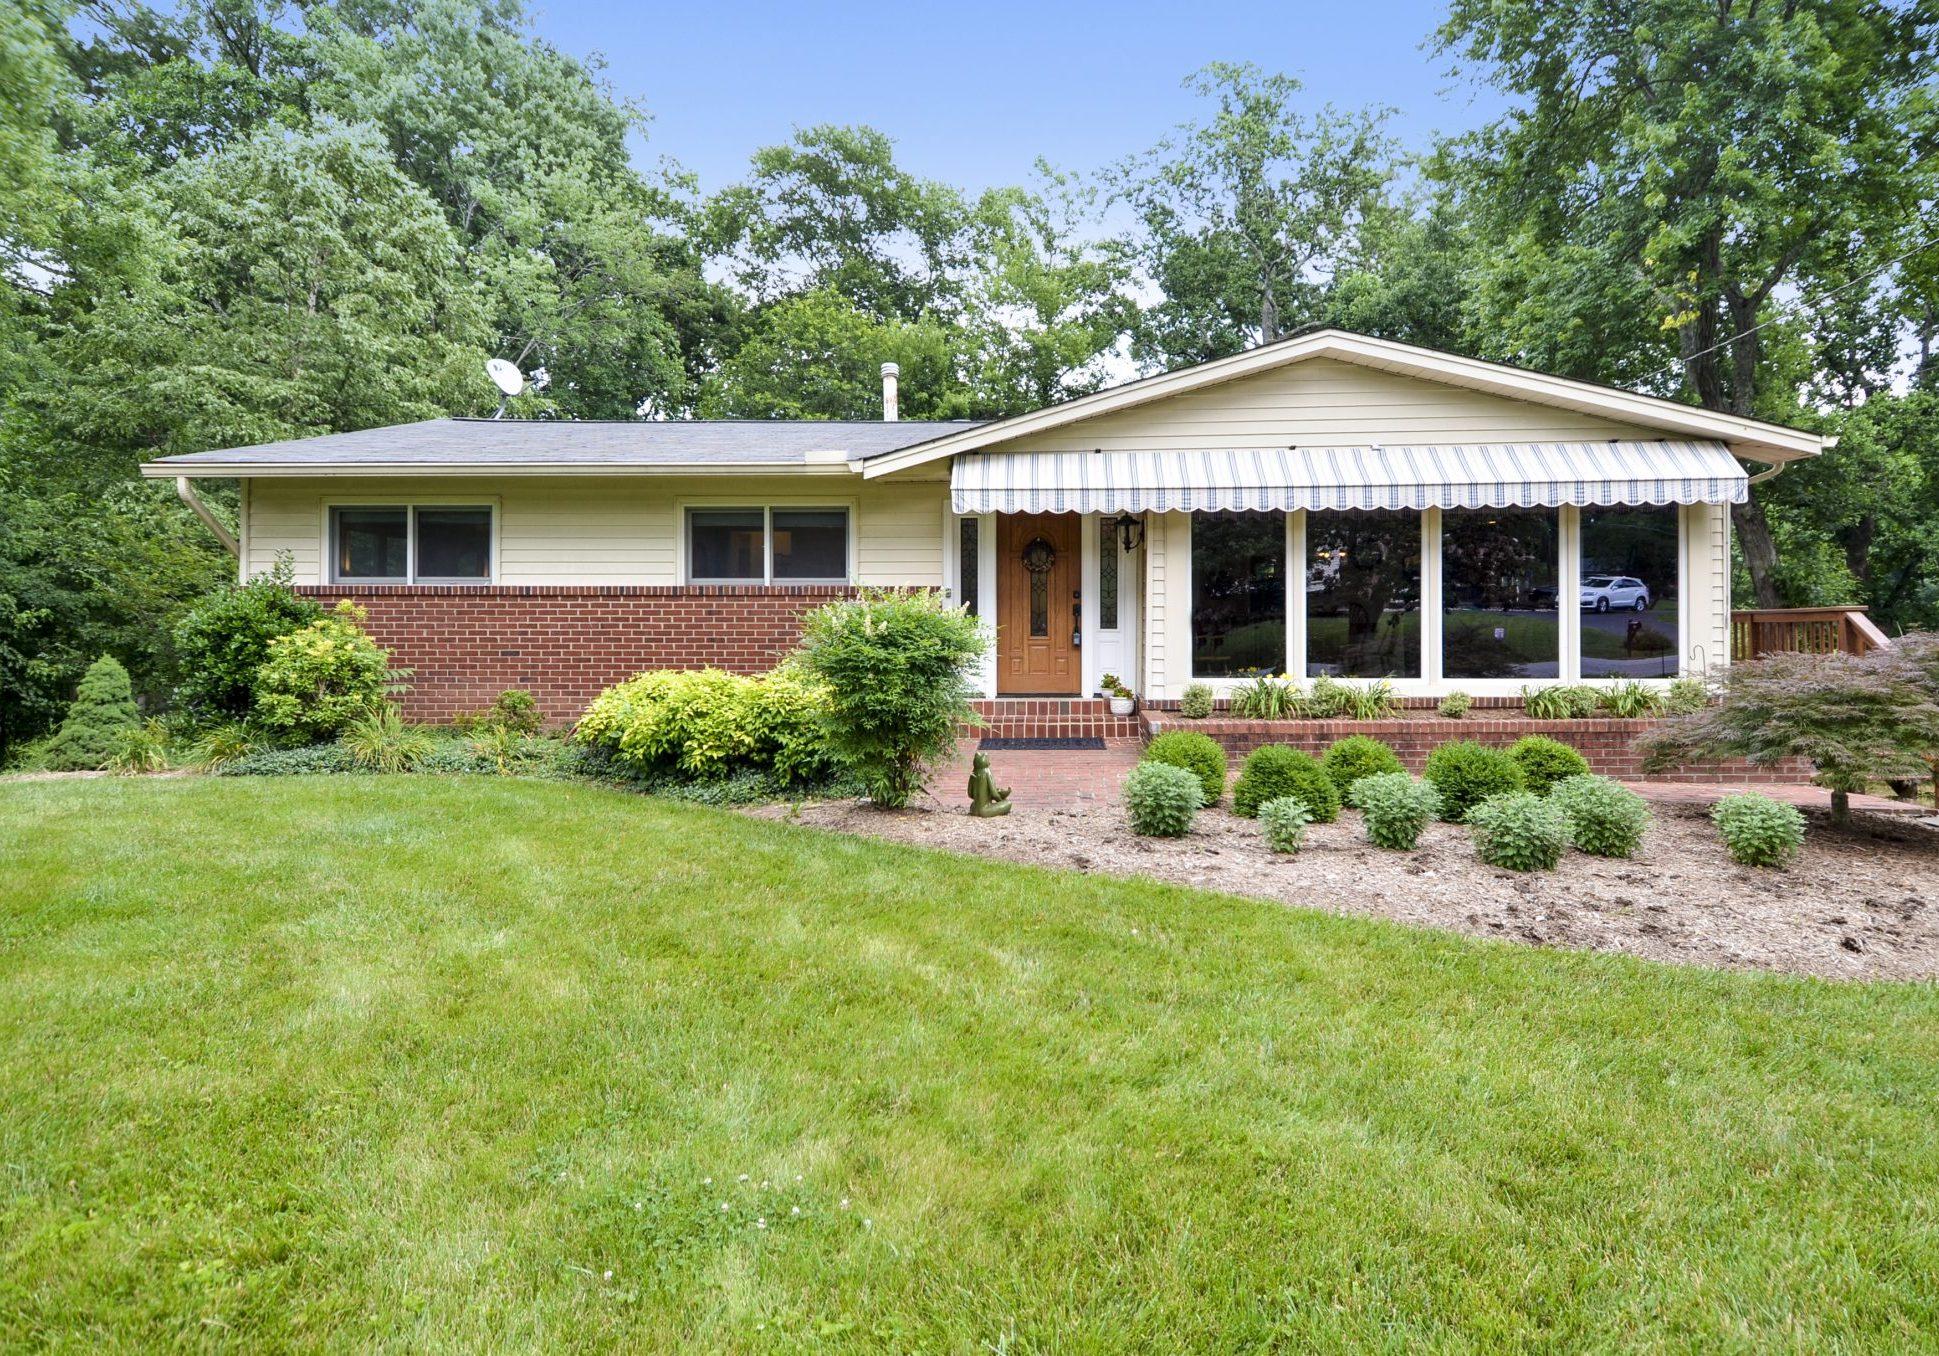 8719 Gateshead Road Alexandria VA Home For Sale | Chelle Gassan, REALTOR® Exterior-8719 Gateshead Rd